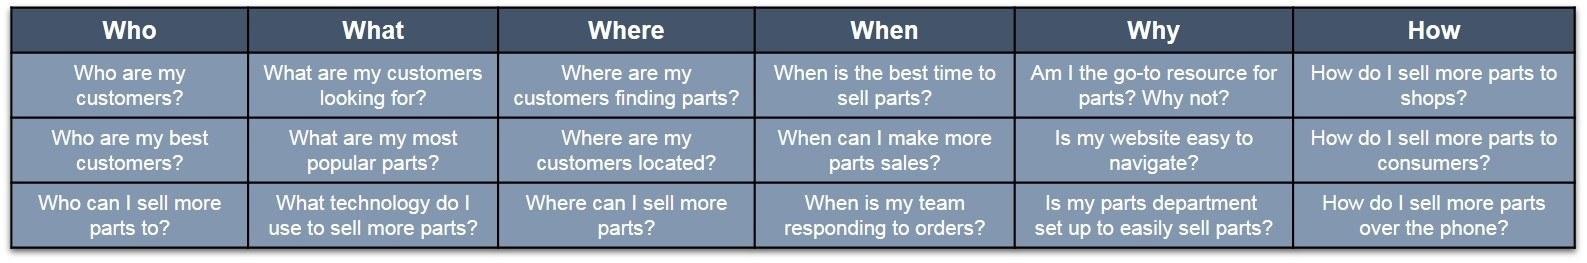 Sales-strategy-grid.jpg#asset:4579